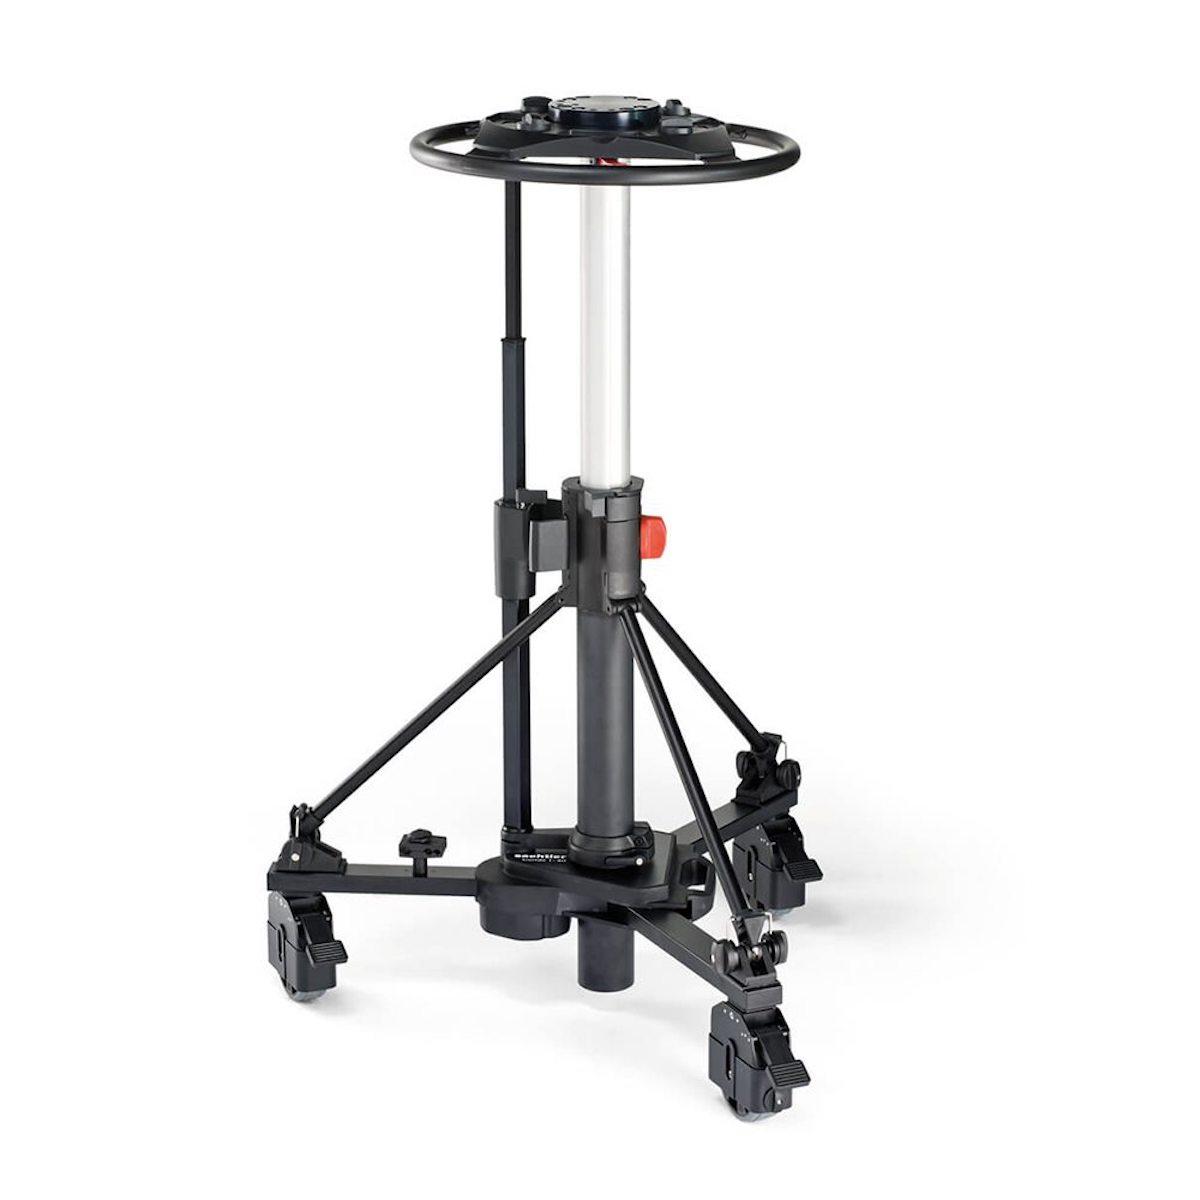 Sachtler Pedestal Combi Ped 1-40